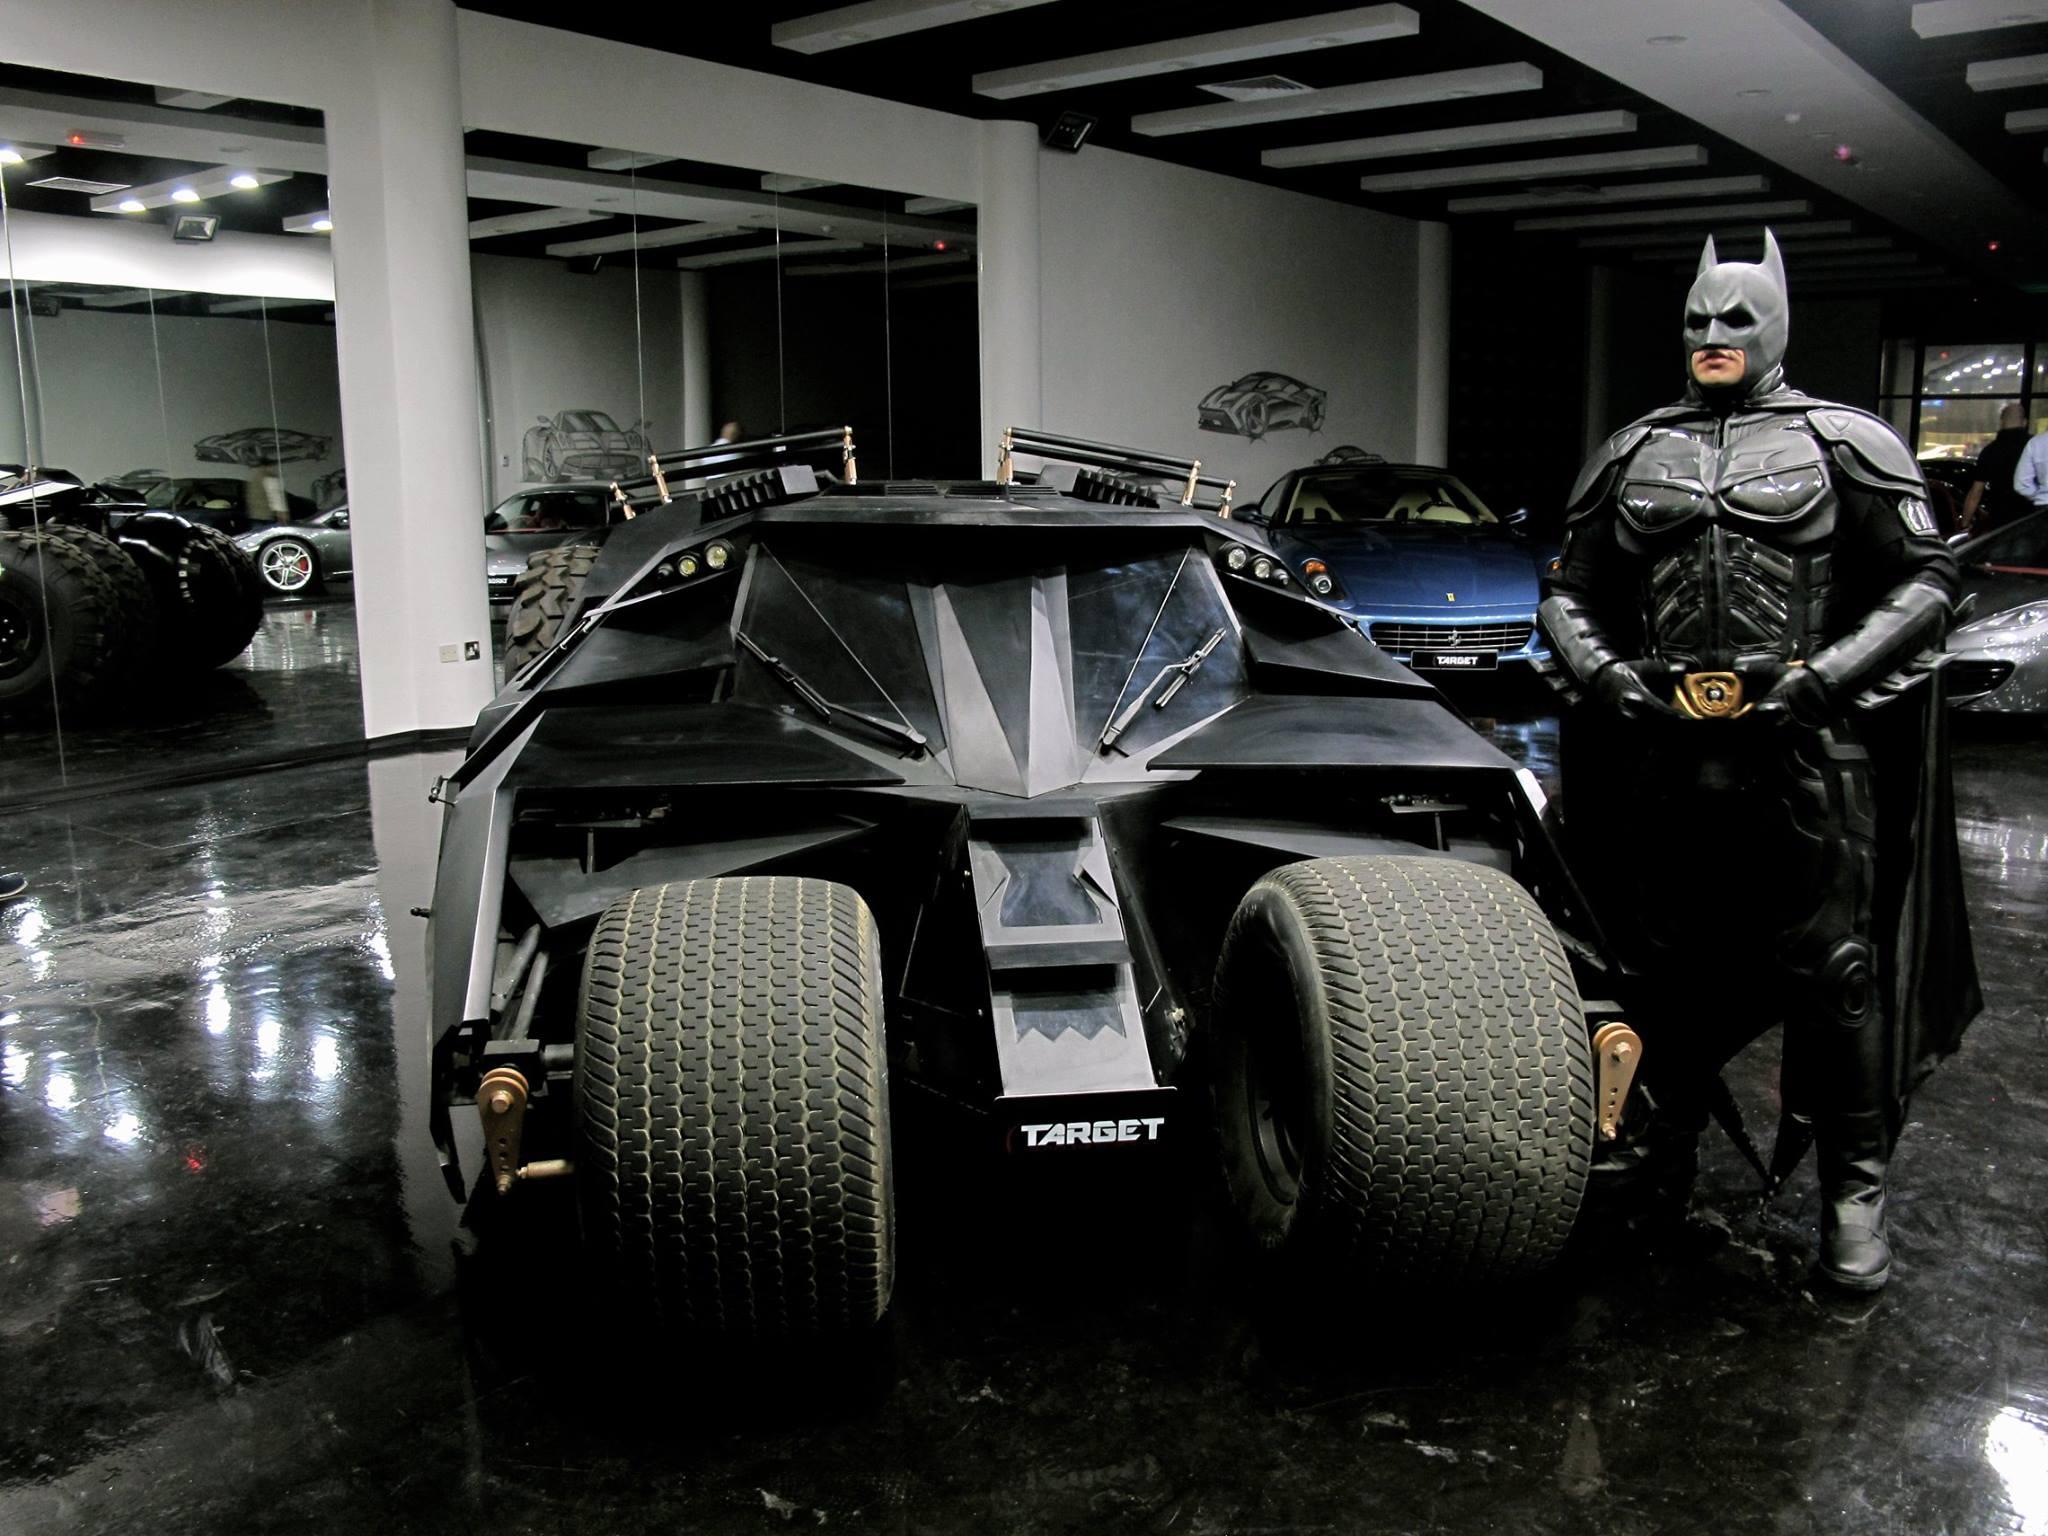 Siêu xe Batmobile xevathethao.vn